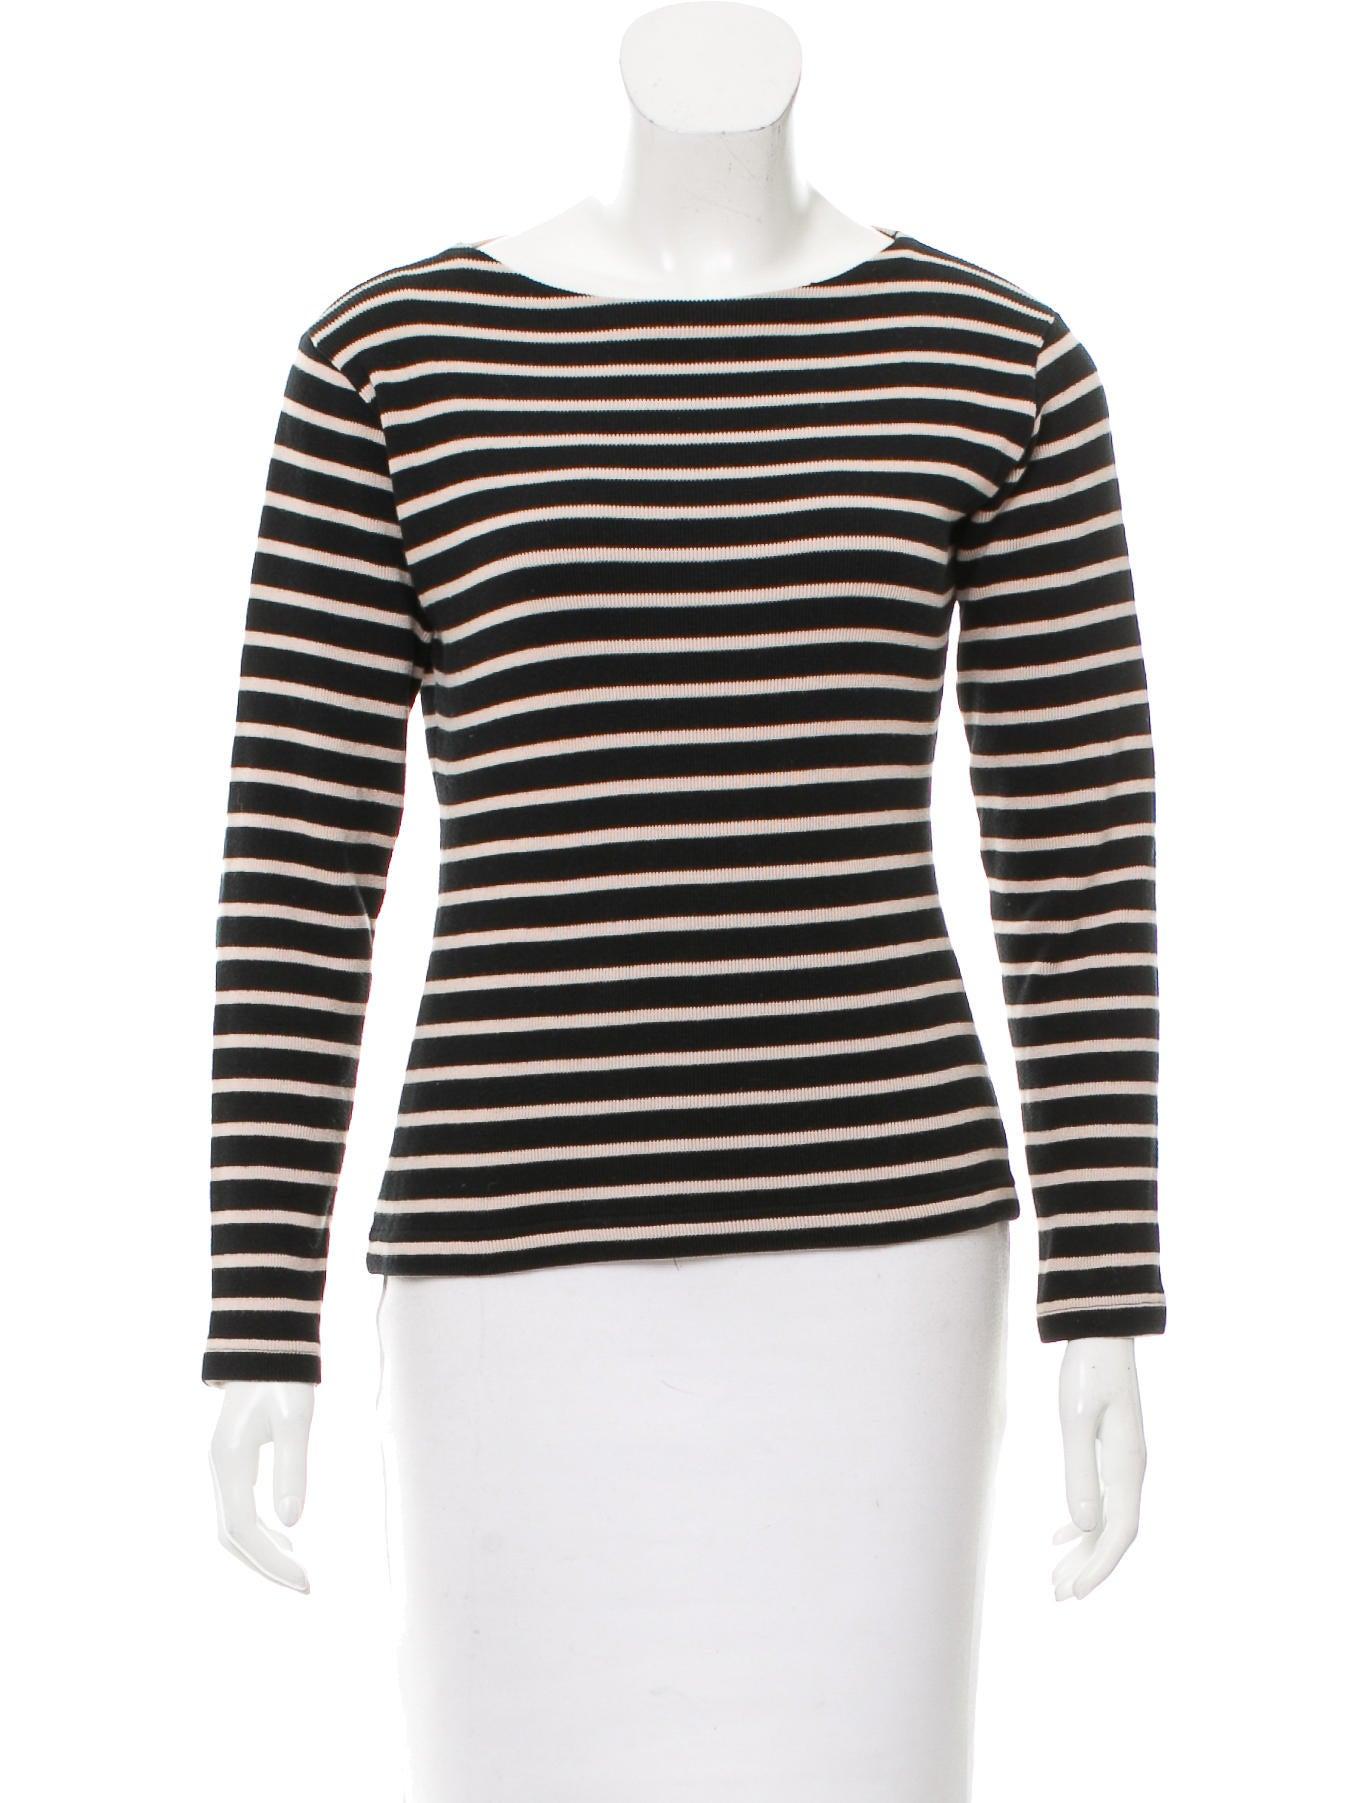 Petit bateau striped long sleeve top clothing for Petit bateau striped shirt